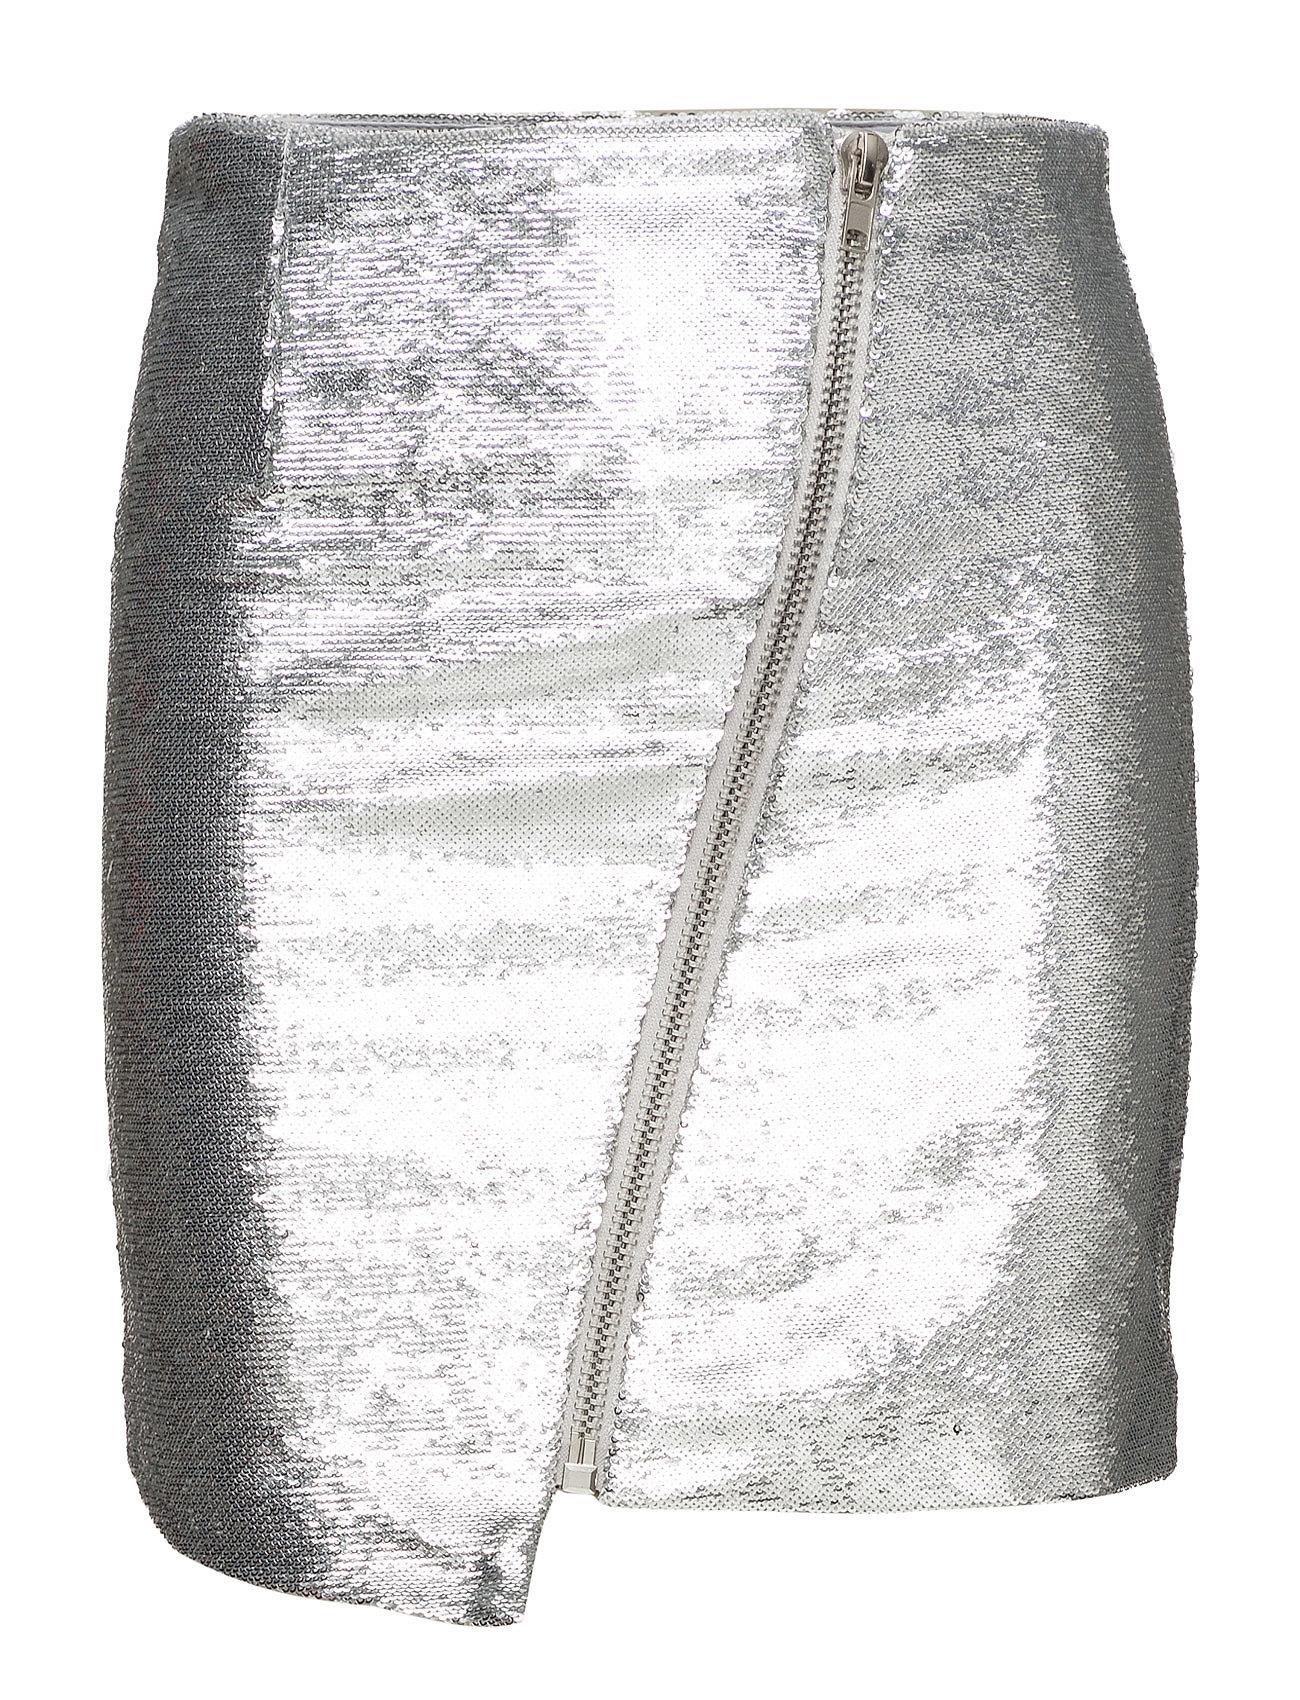 zoe karssen – Asymmetric zip mini skirt på boozt.com dk